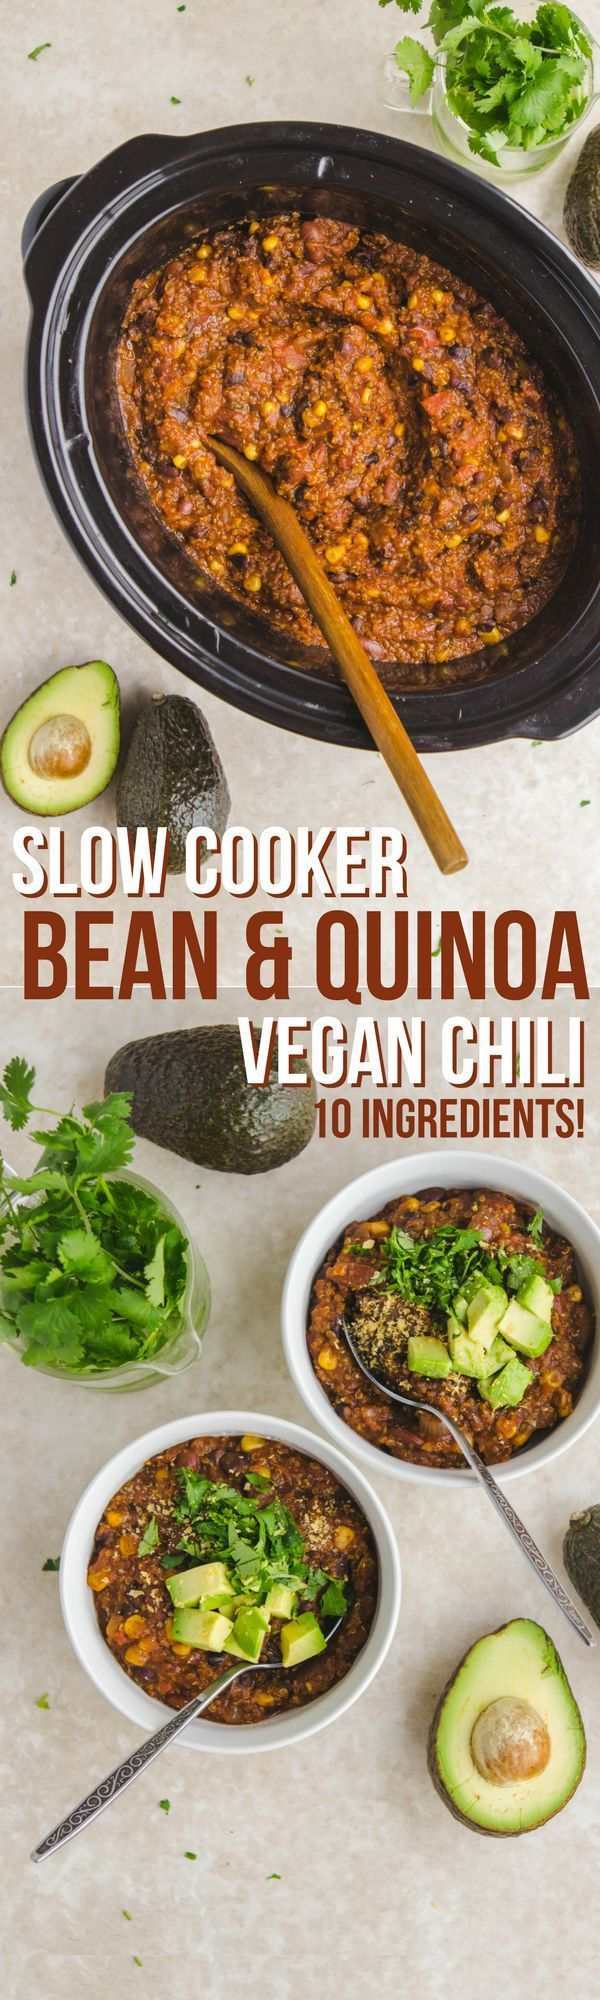 Slow Cooker Vegan Bean Quinoa Chili